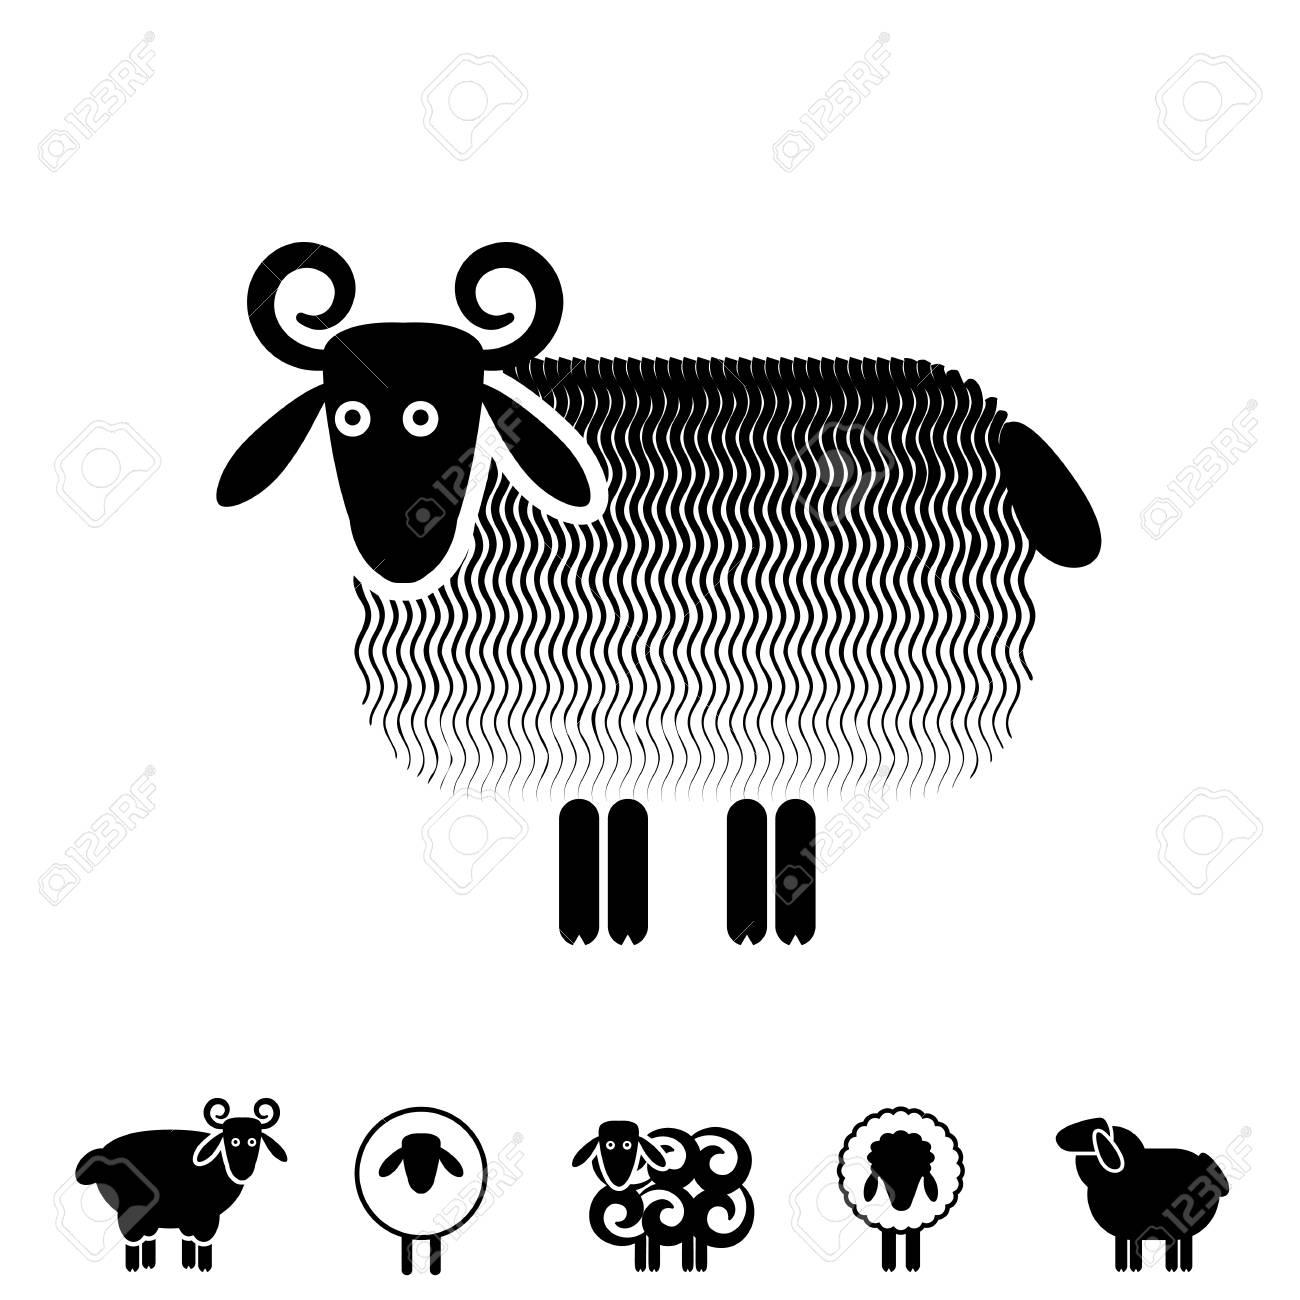 Sheep Template - Resume Ideas - namanasa.com